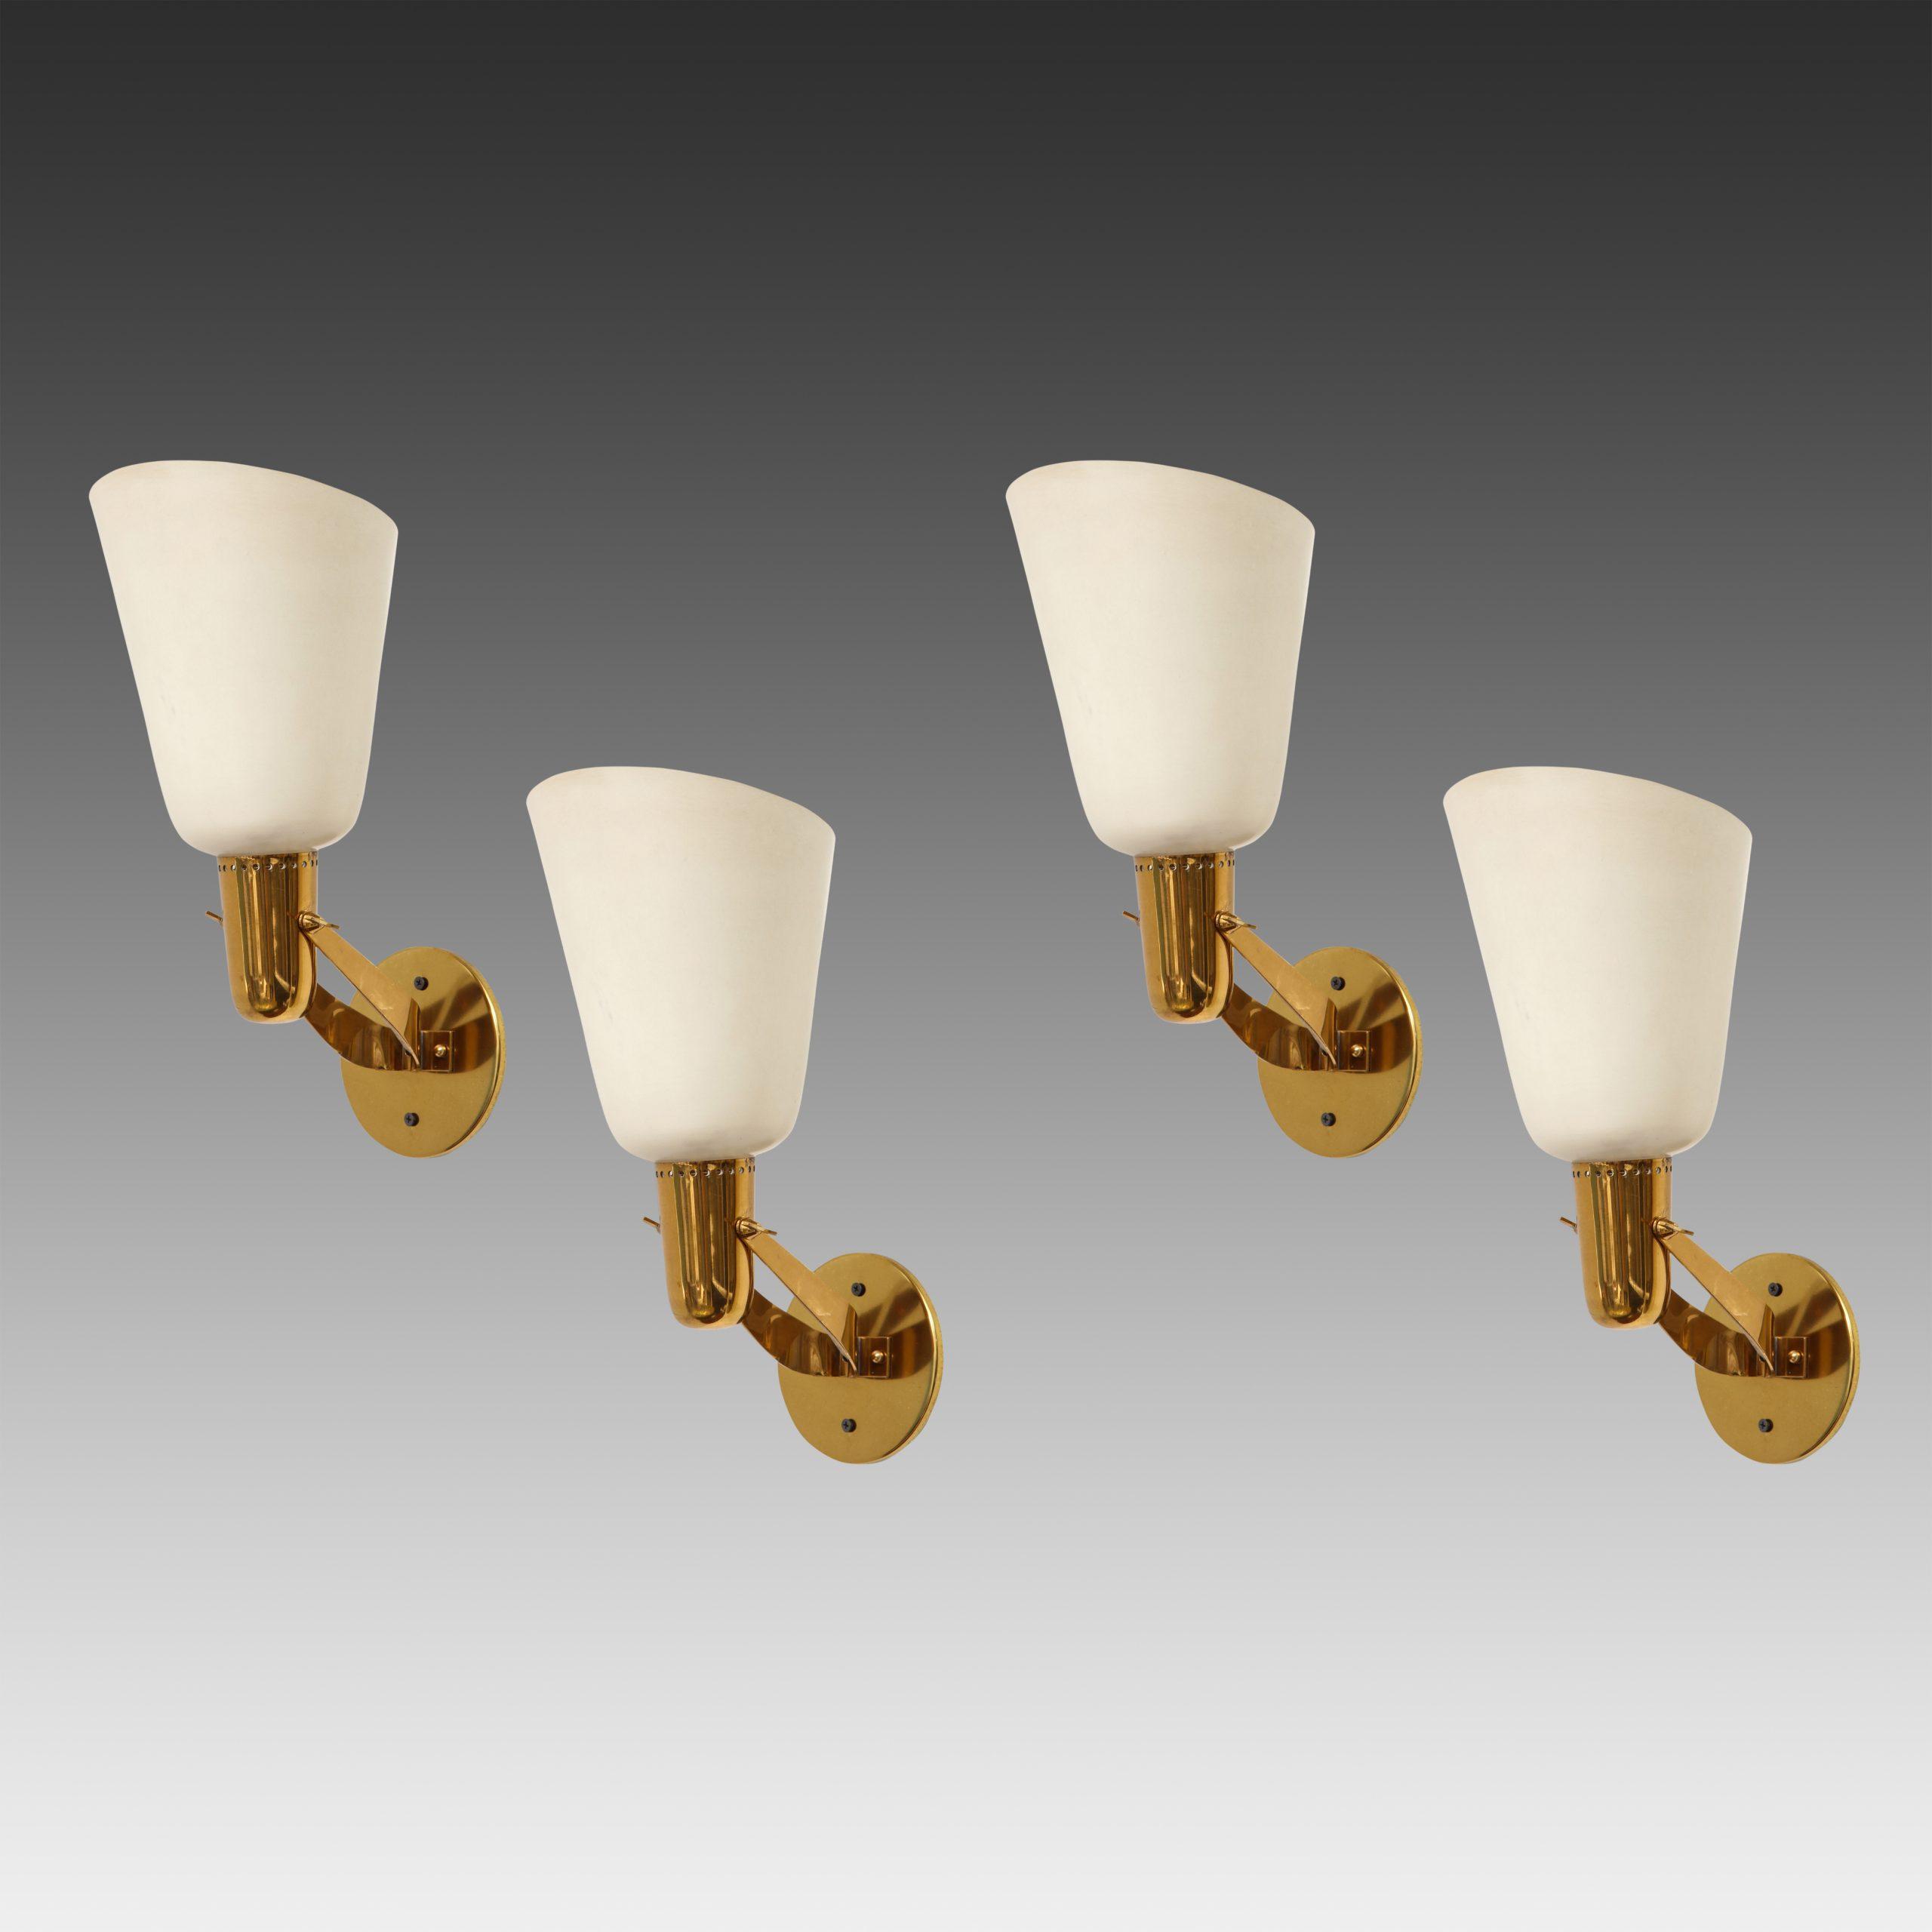 Rare Set of 4 Sconces Model 121 by Gino Sarfatti for Arteluce   soyun k.